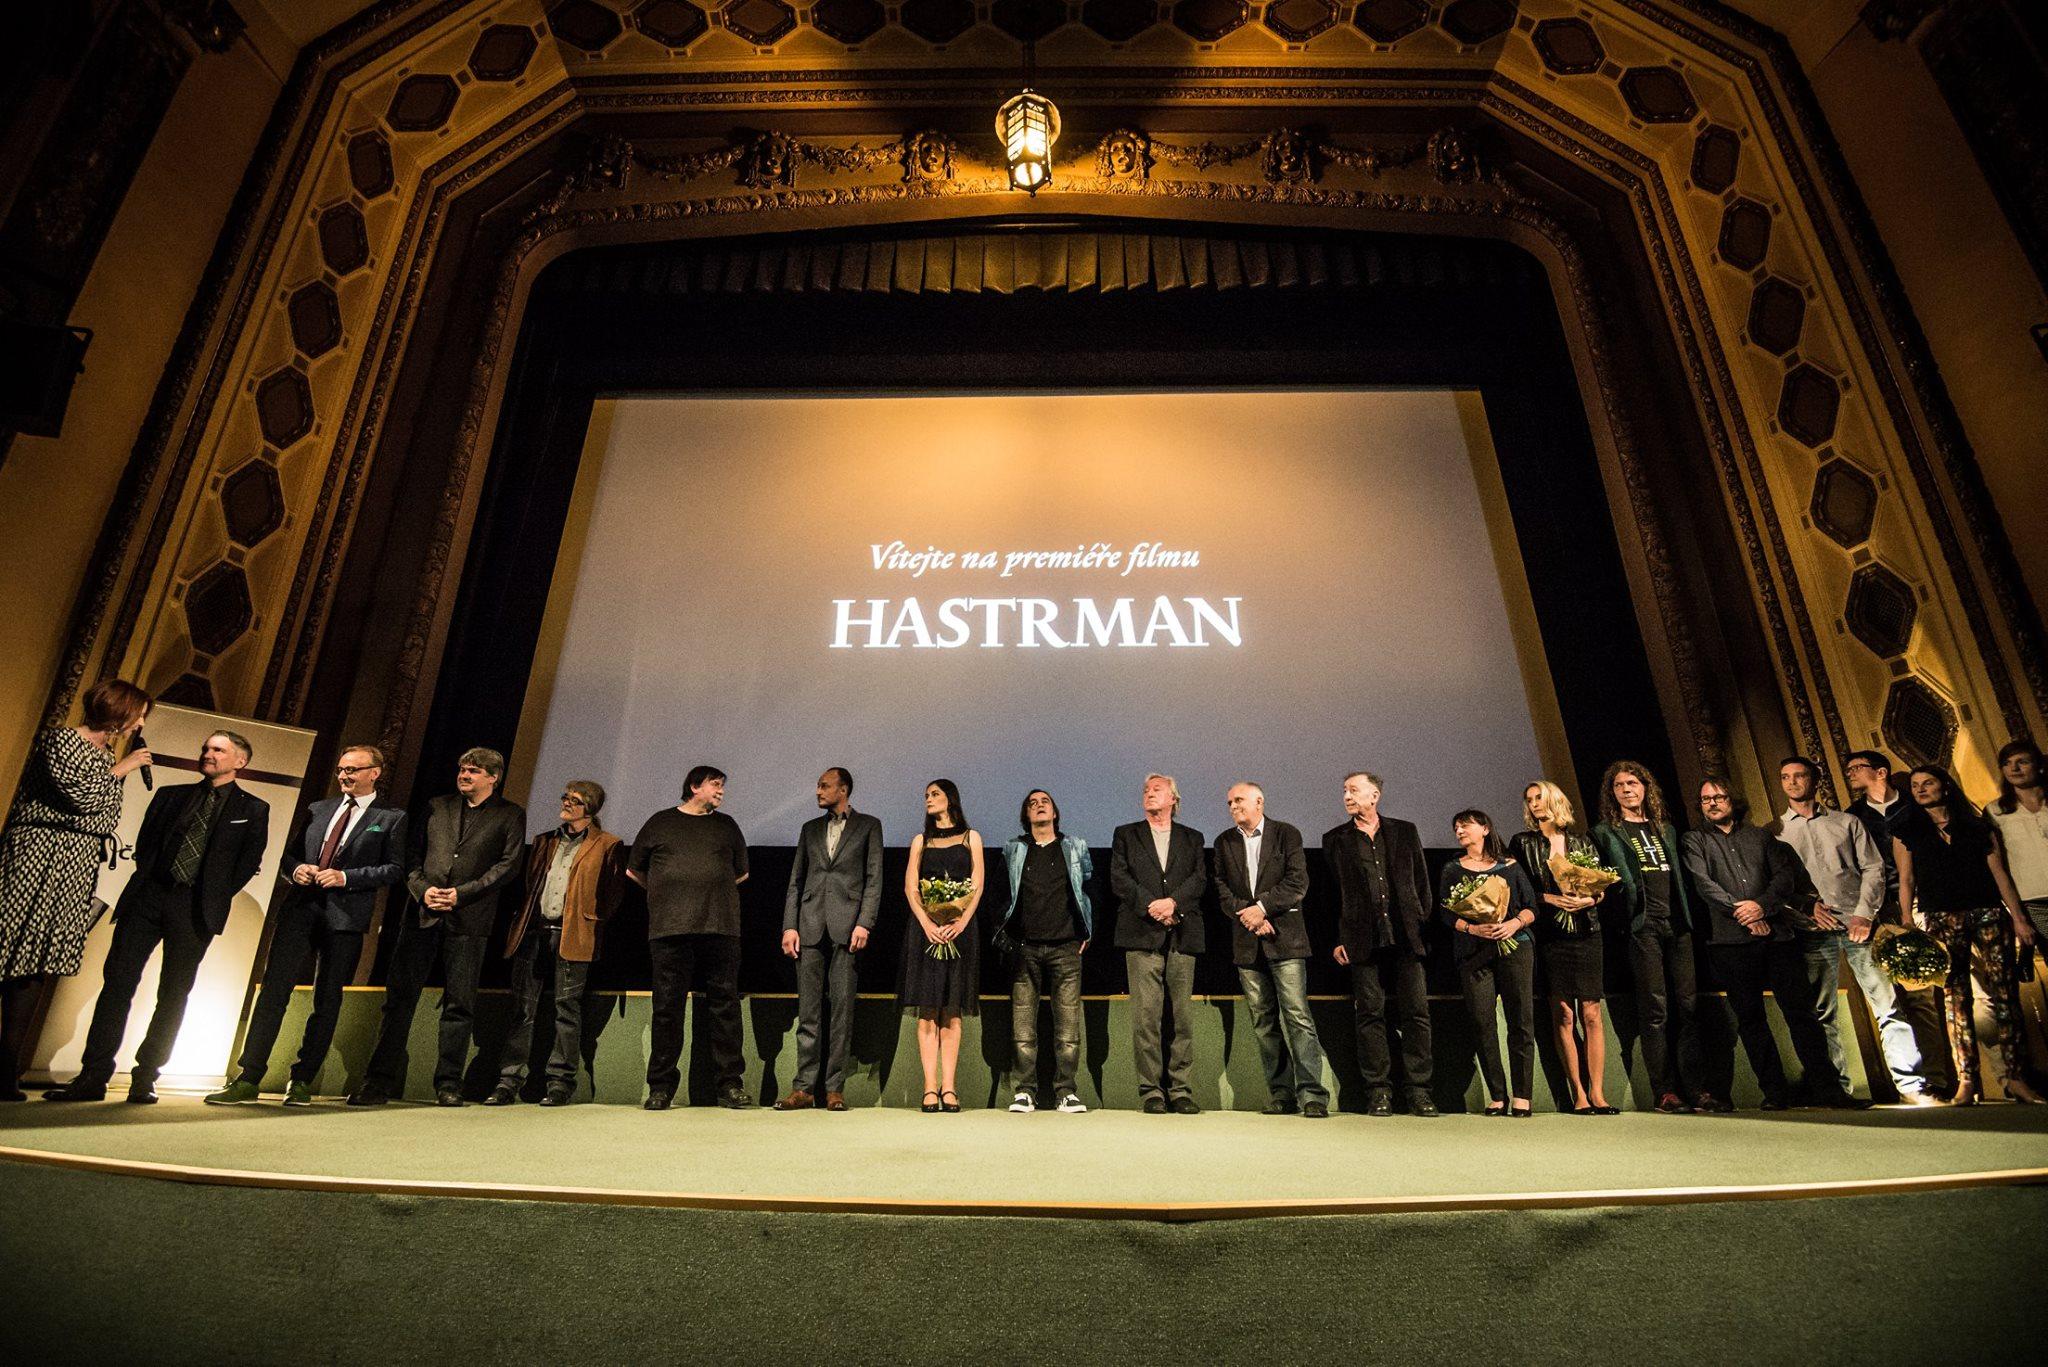 Urban_film Hastrman